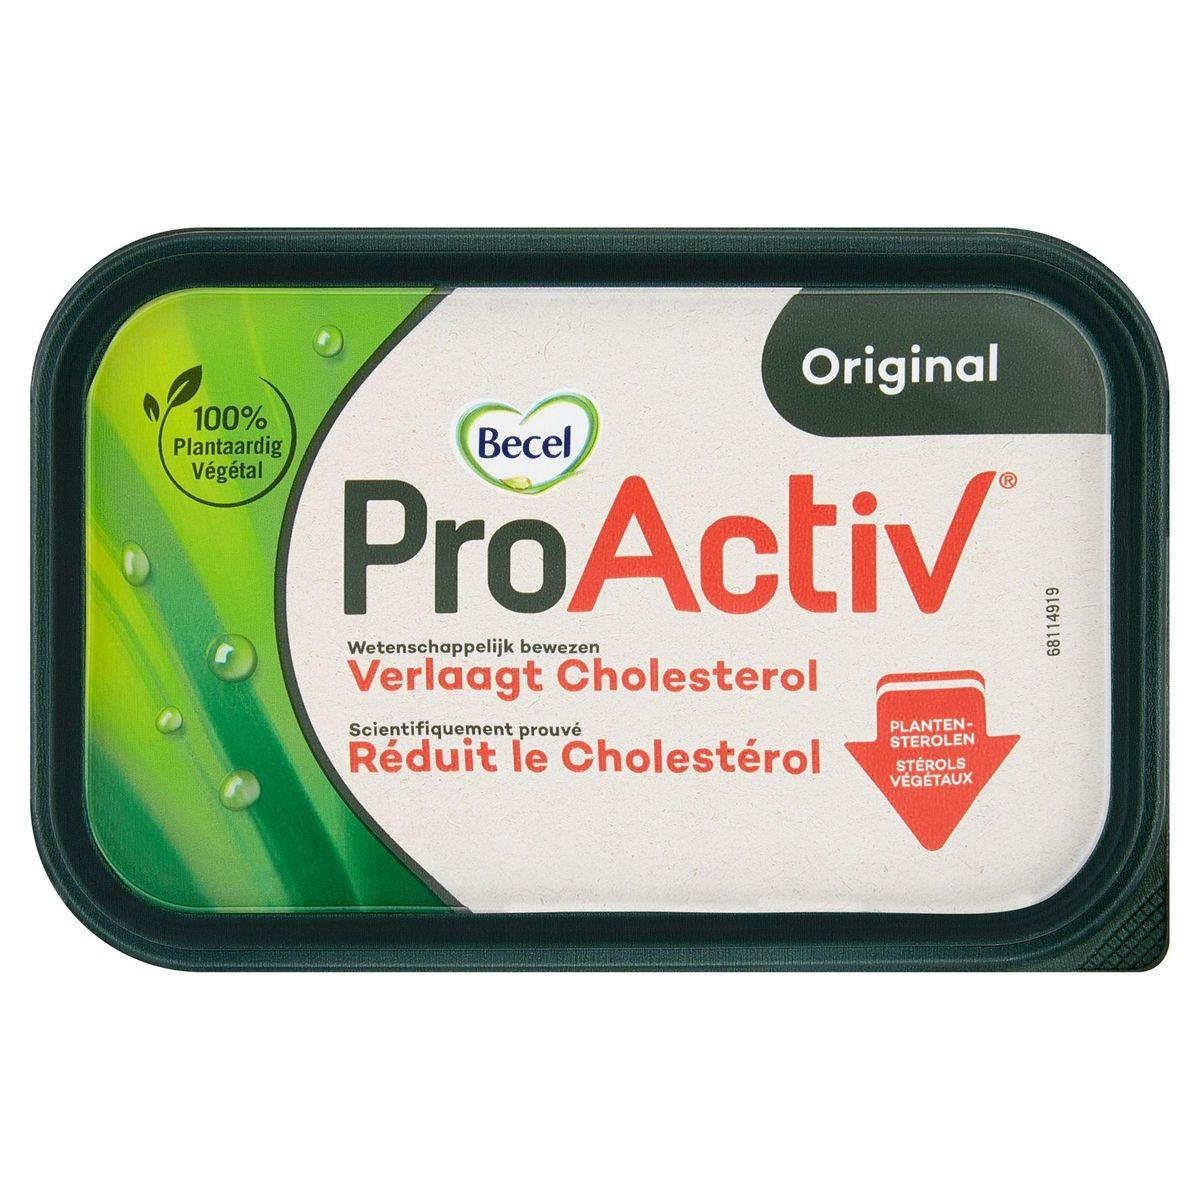 Becel ProActiv Original 475 g